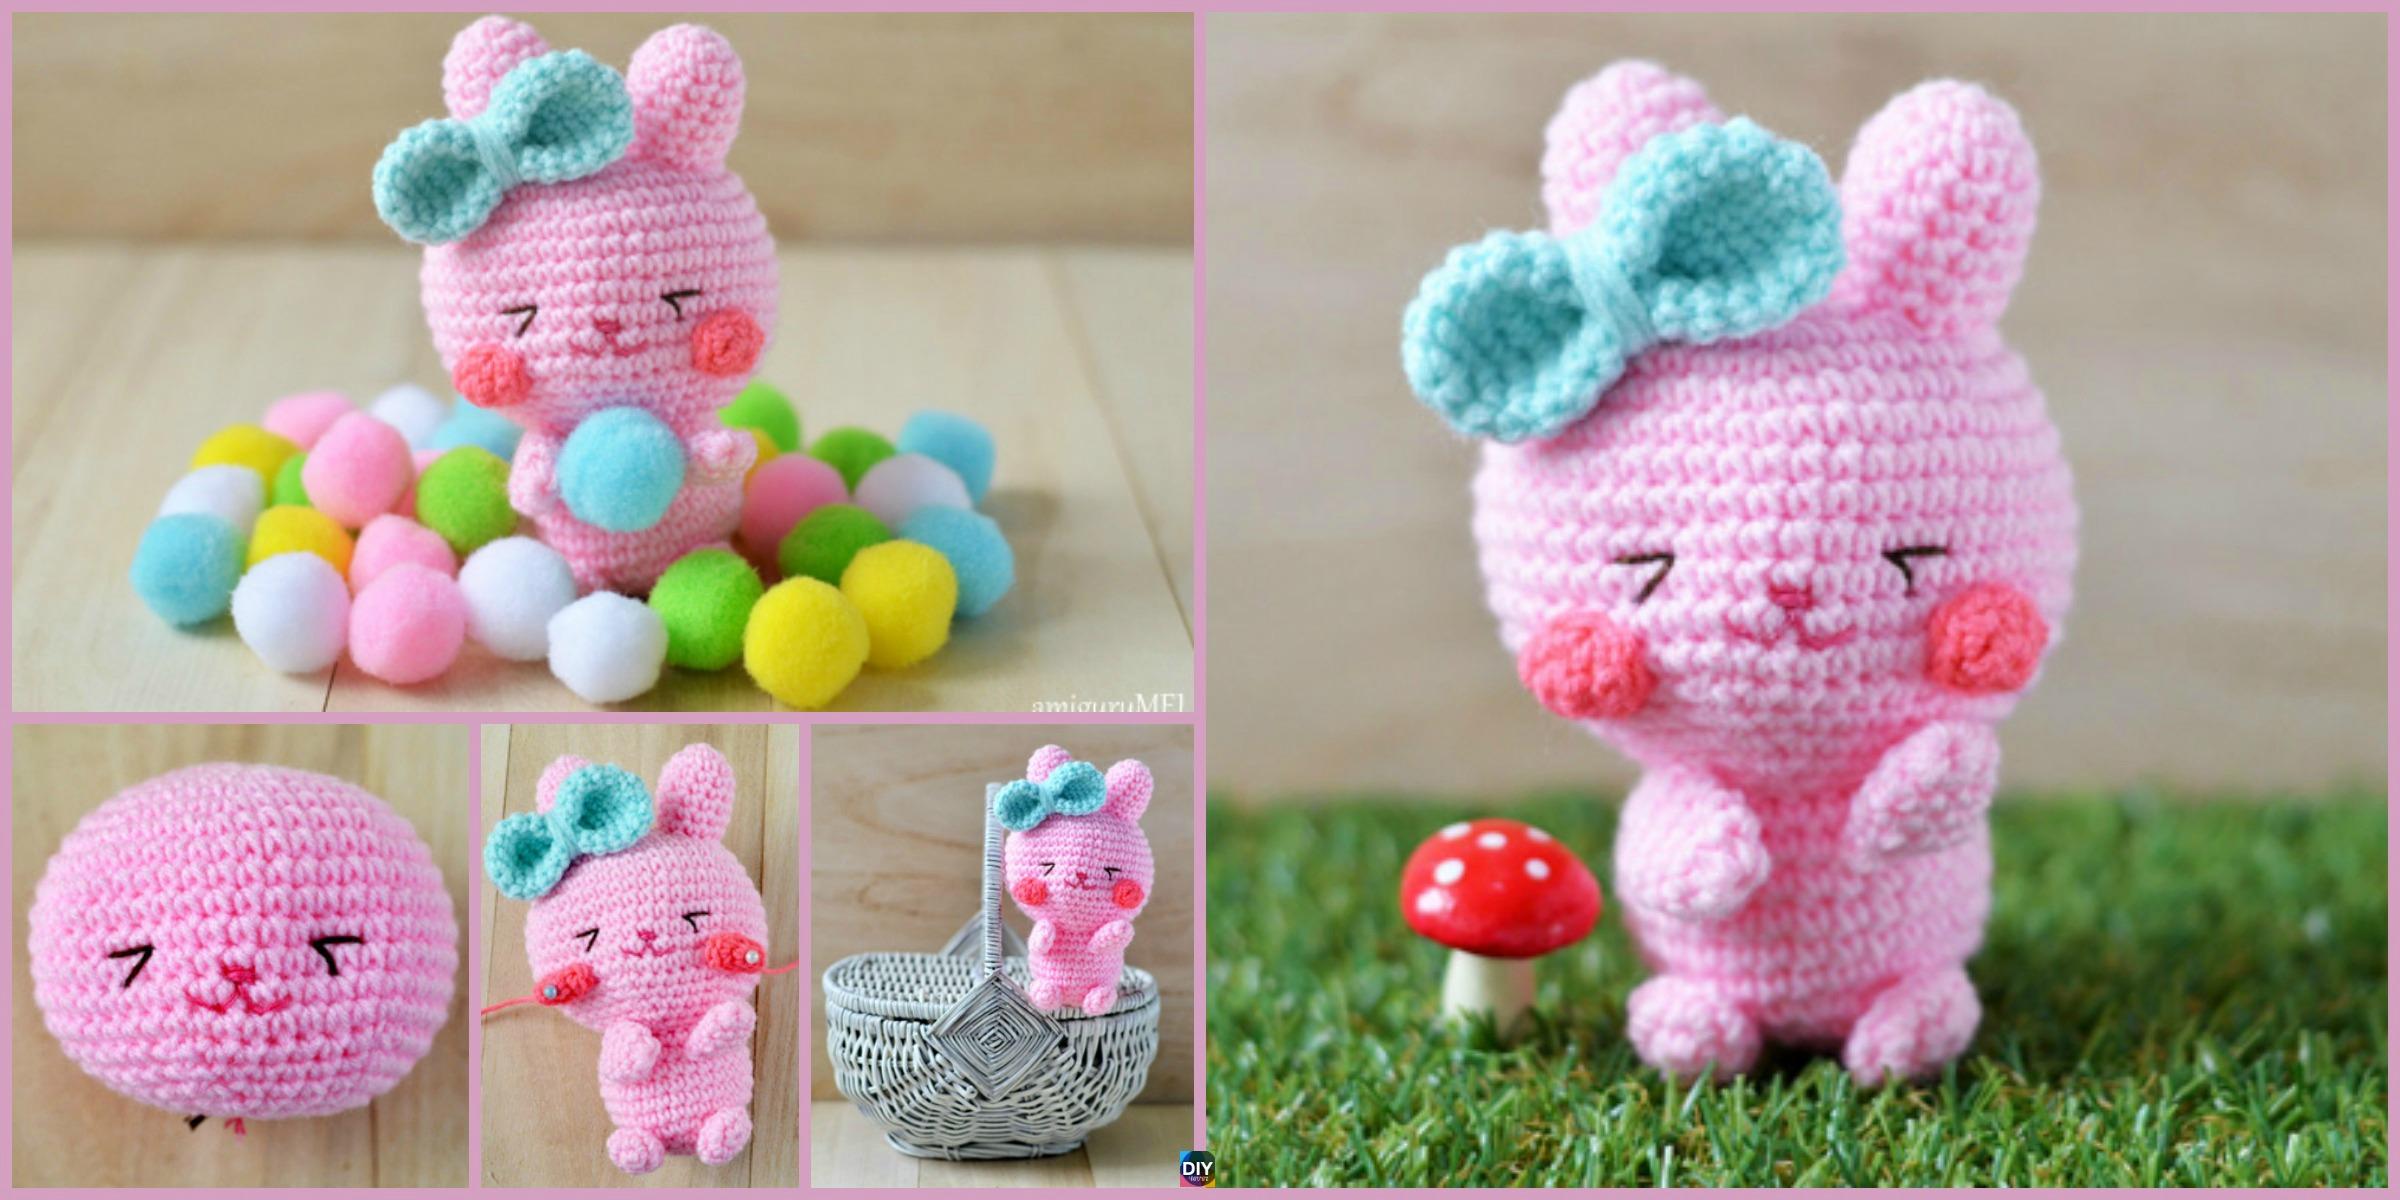 Crochet Easter Bunny Amigurumi – Free Pattern